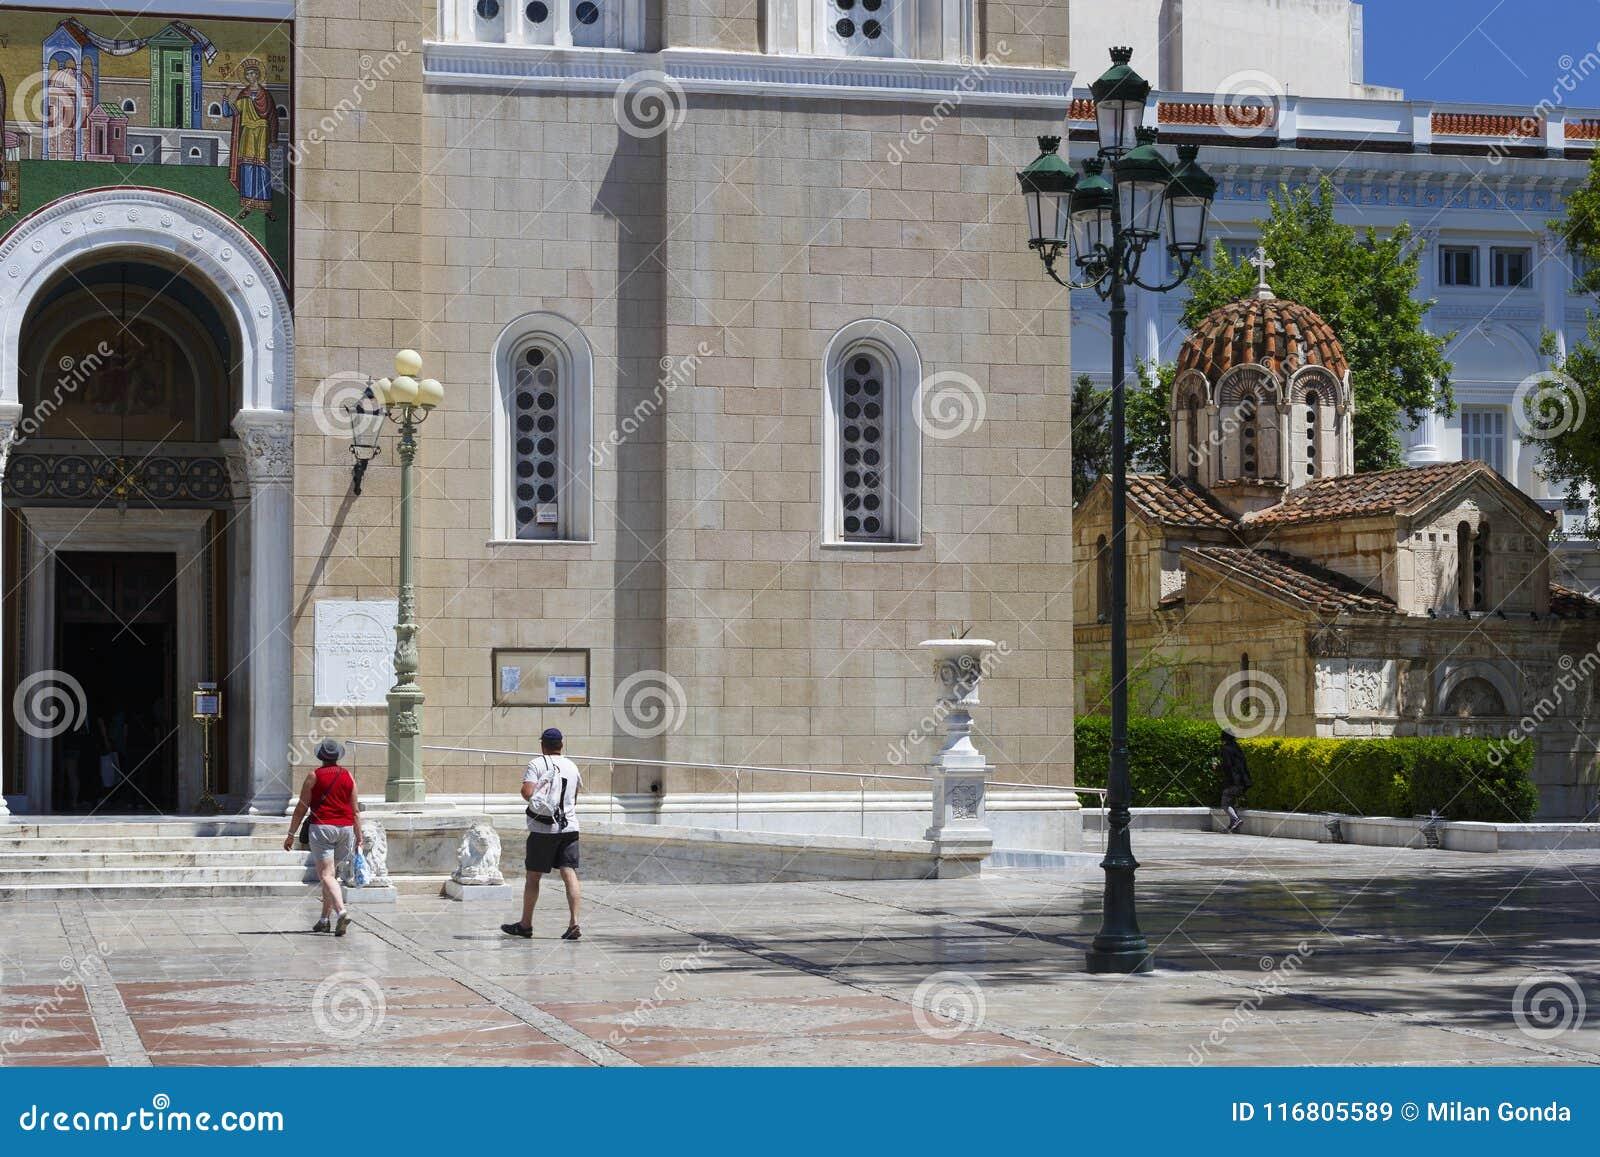 Turisti alla cattedrale metropolitana di Atene